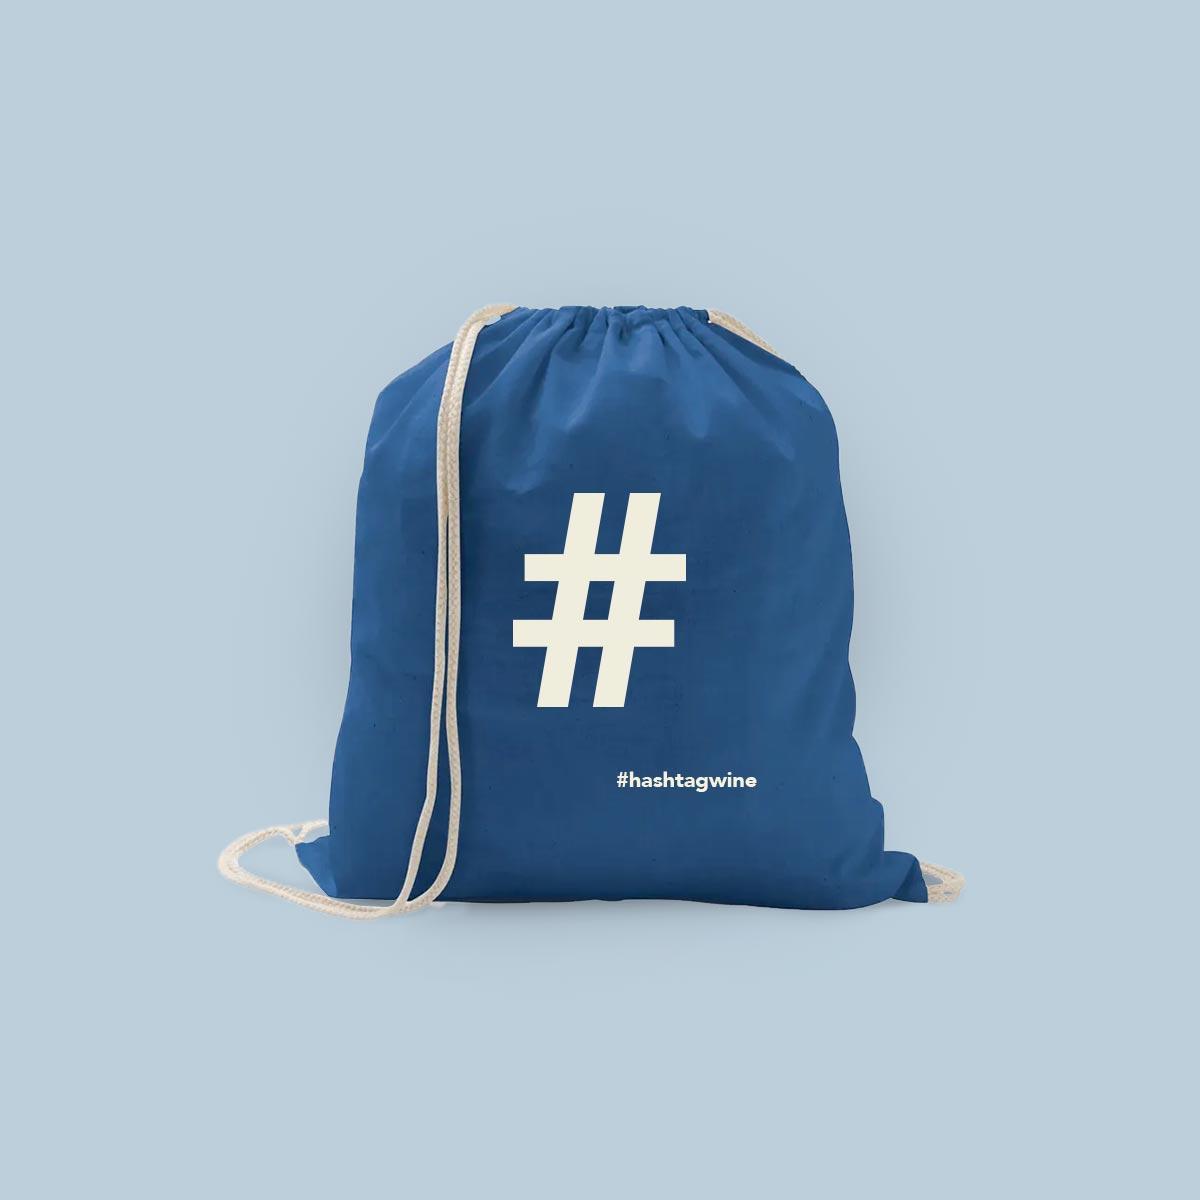 bolsa algodon hashtagwine